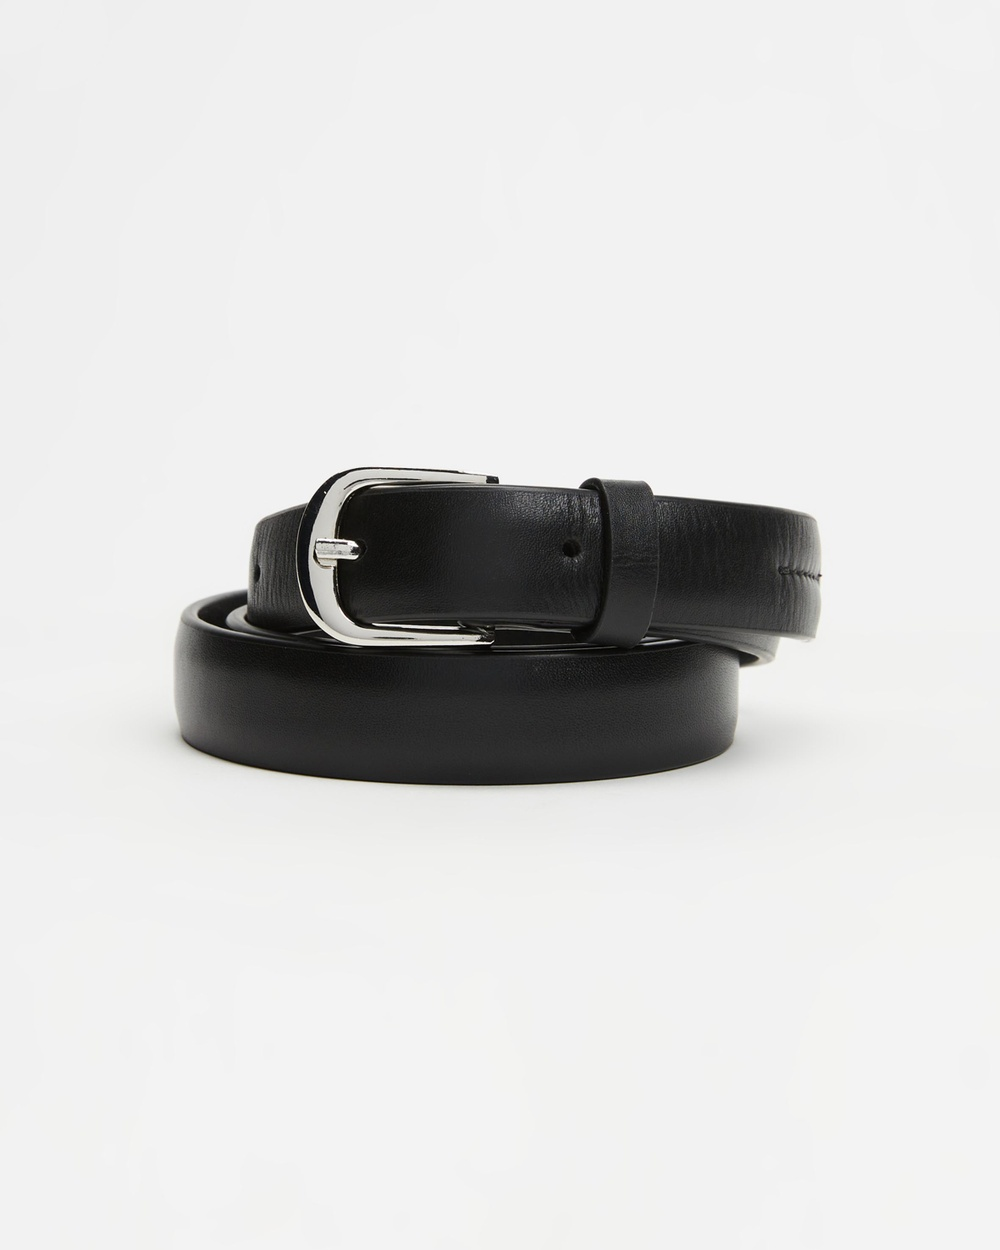 Fall The Label Slim Leather Belt Belts Black & Silver Buckle